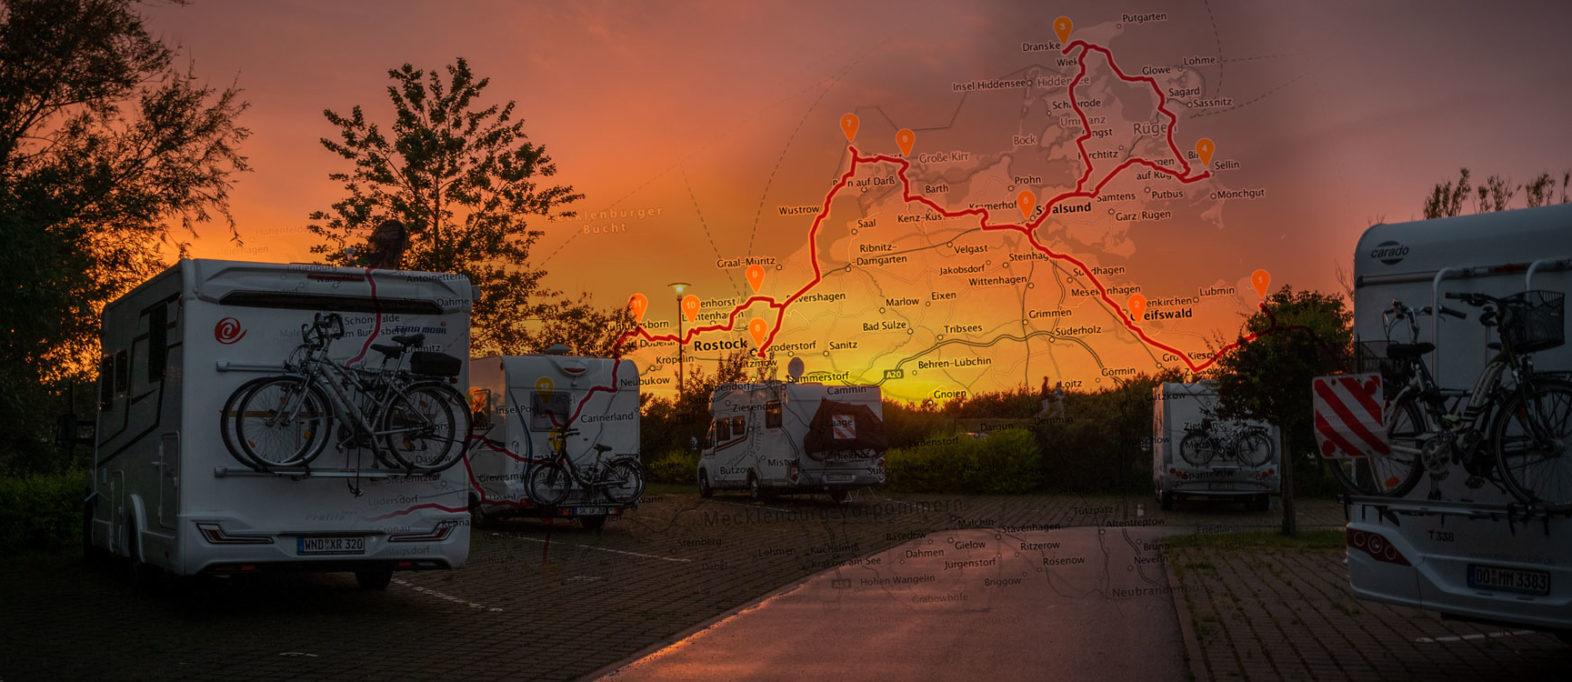 Camping Ostsee Wohnmobil Karte